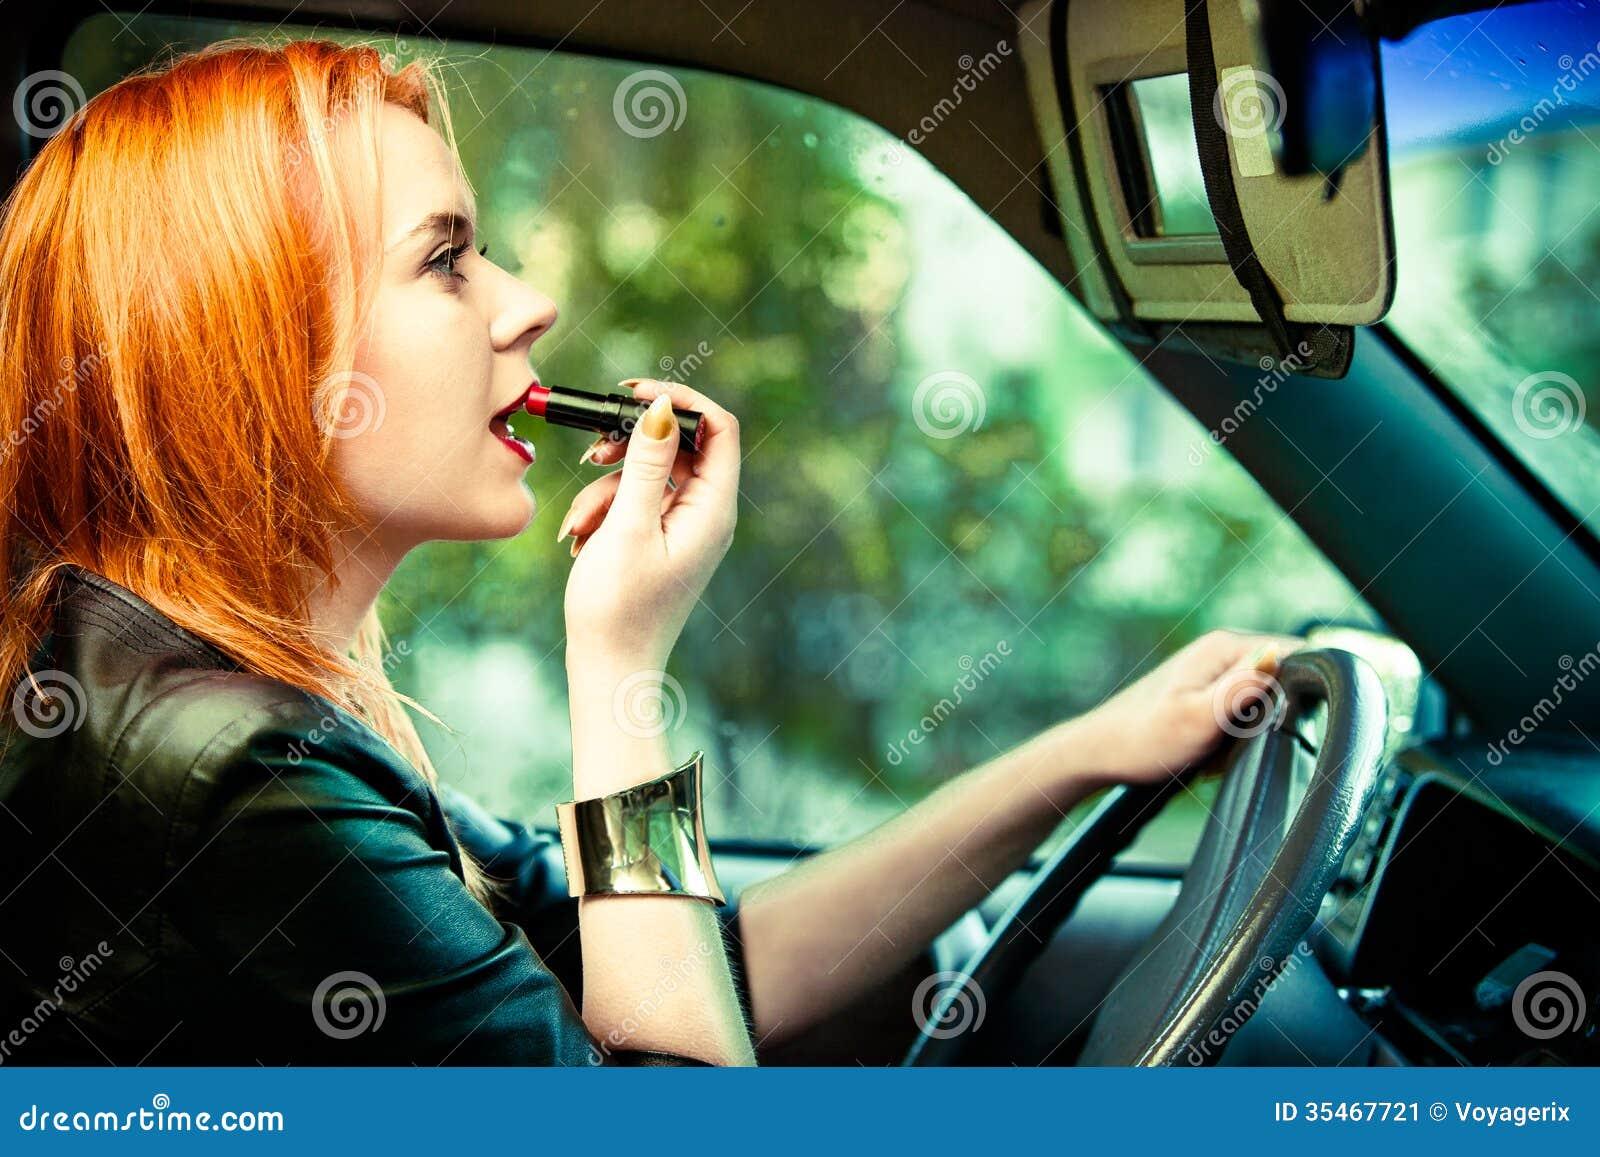 Lipstick Painting Car